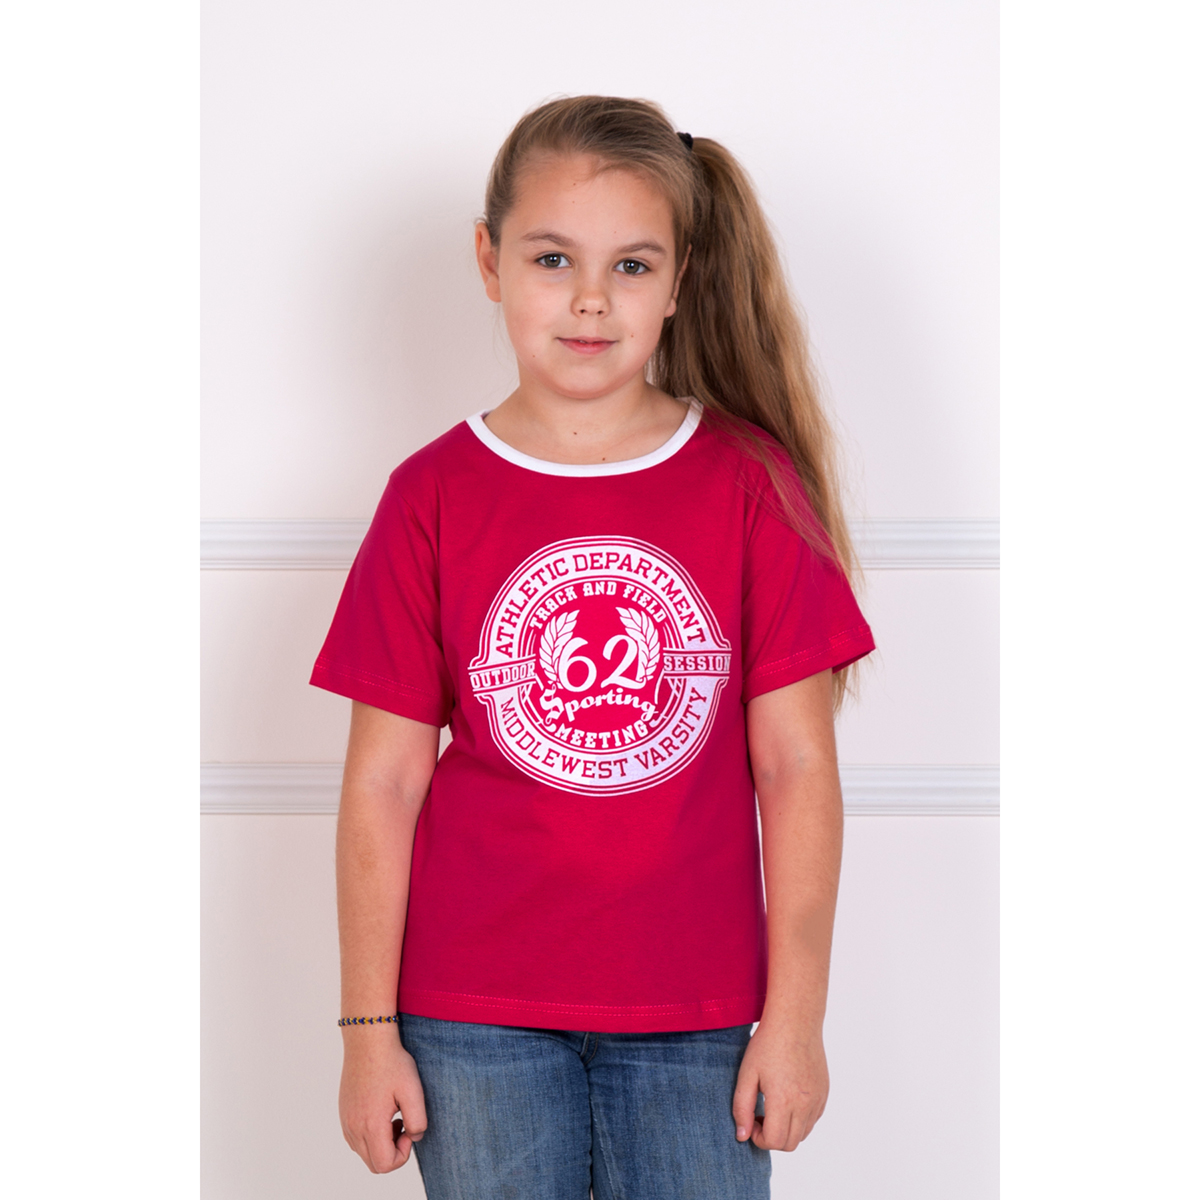 Детская футболка Камелот Малиновый, размер 34Распродажа<br><br><br>Тип: Дет. футболка<br>Размер: 34<br>Материал: Кулирка